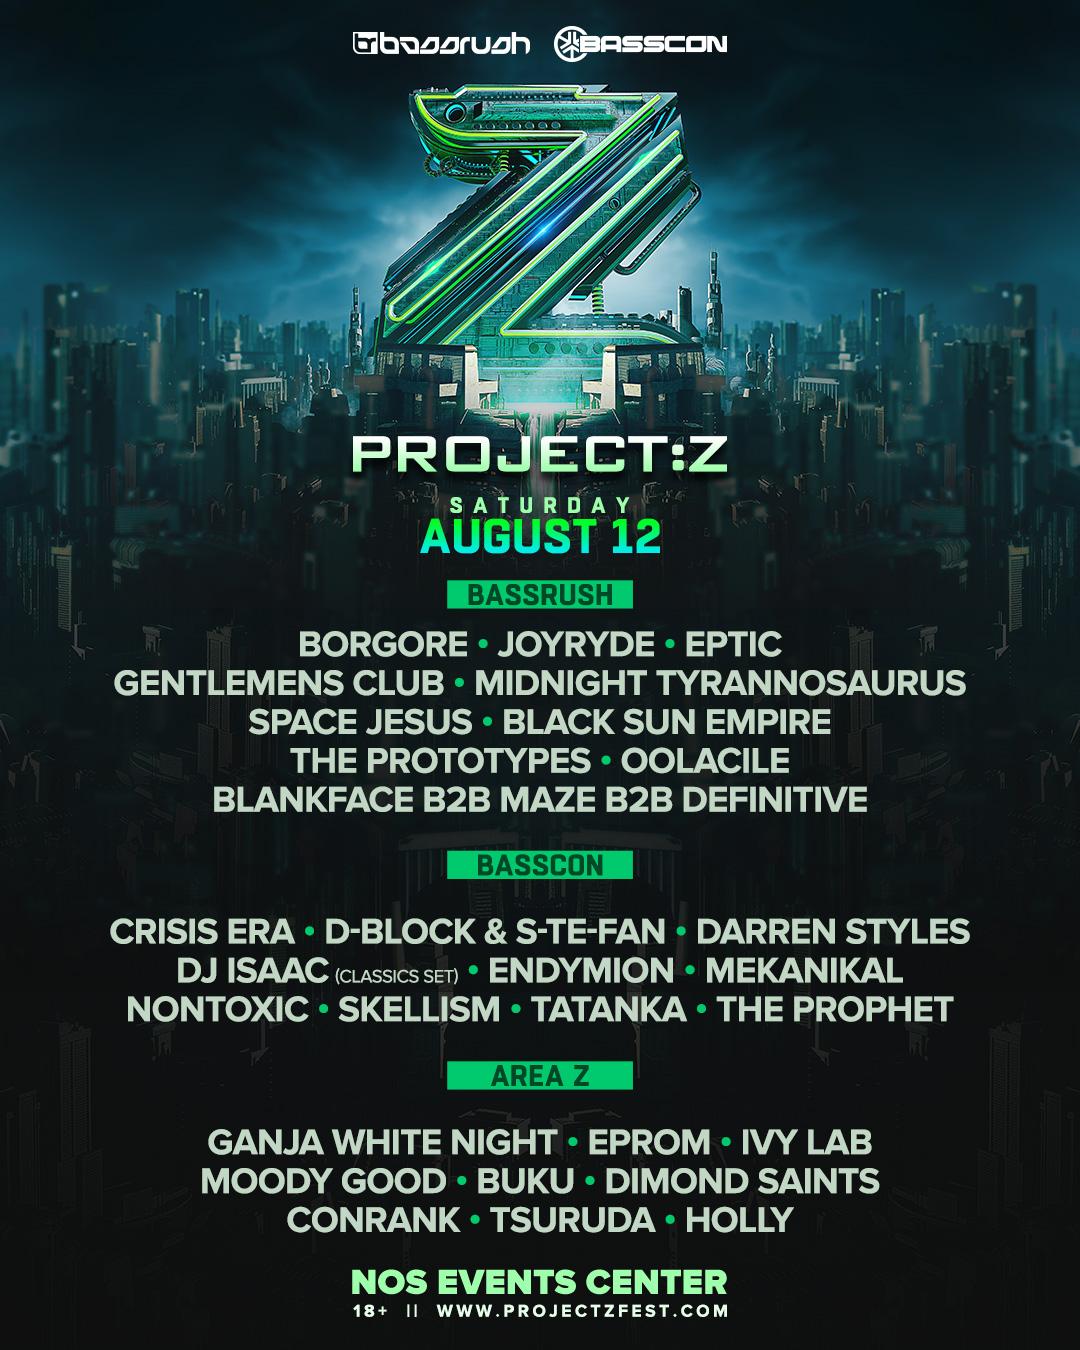 Project z 2017 lineup asset